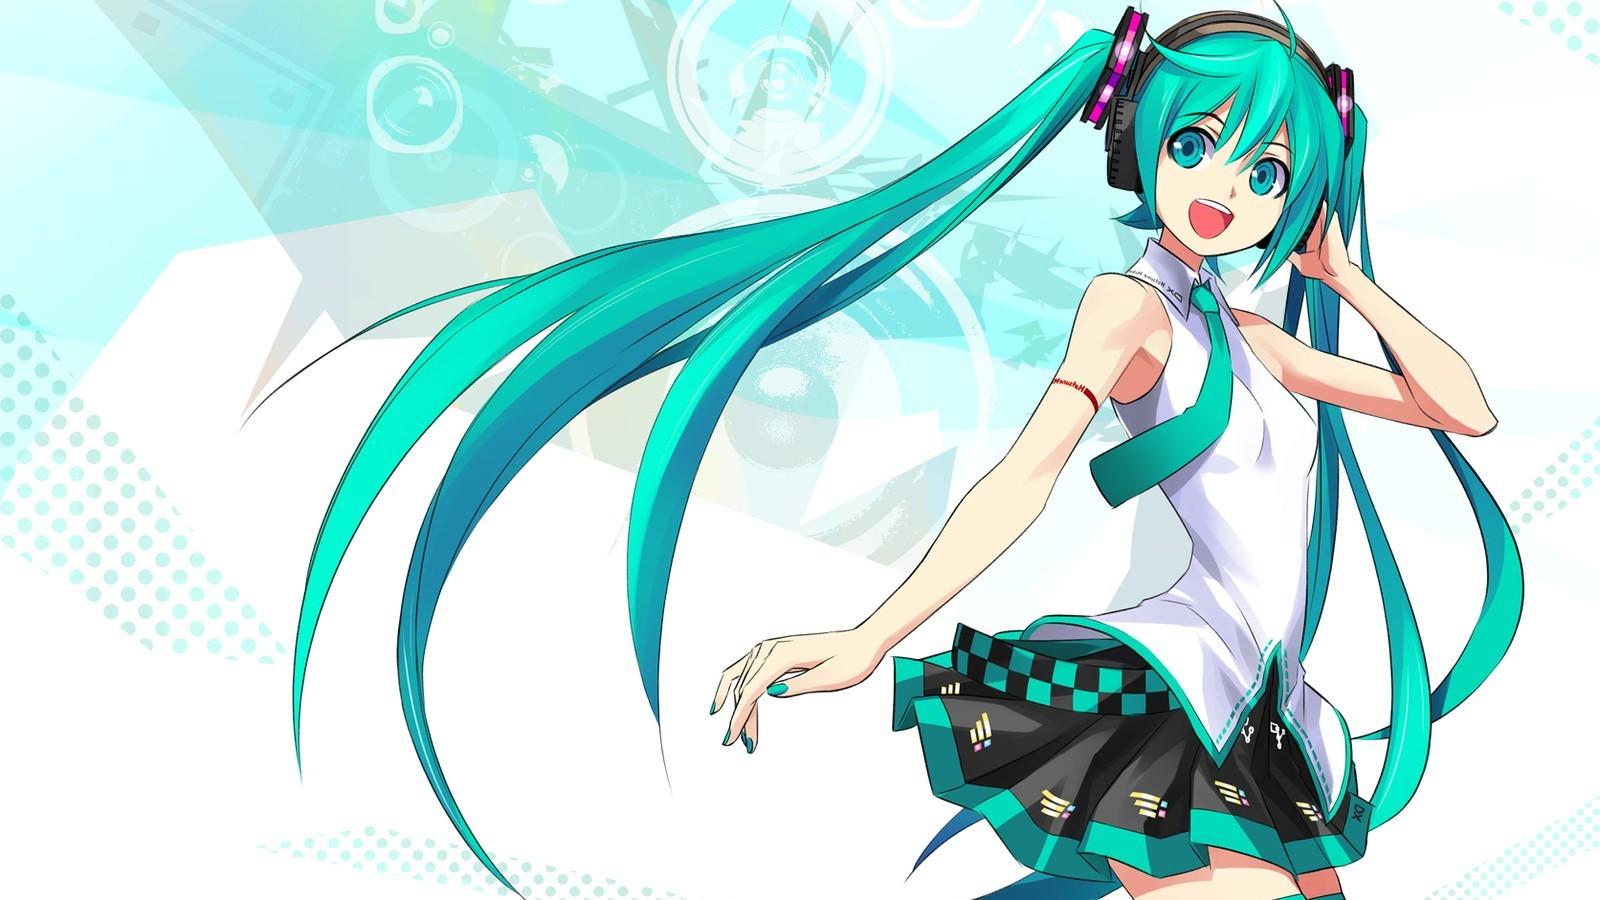 1600x900 Px Anime Hatsune Miku Vocaloid